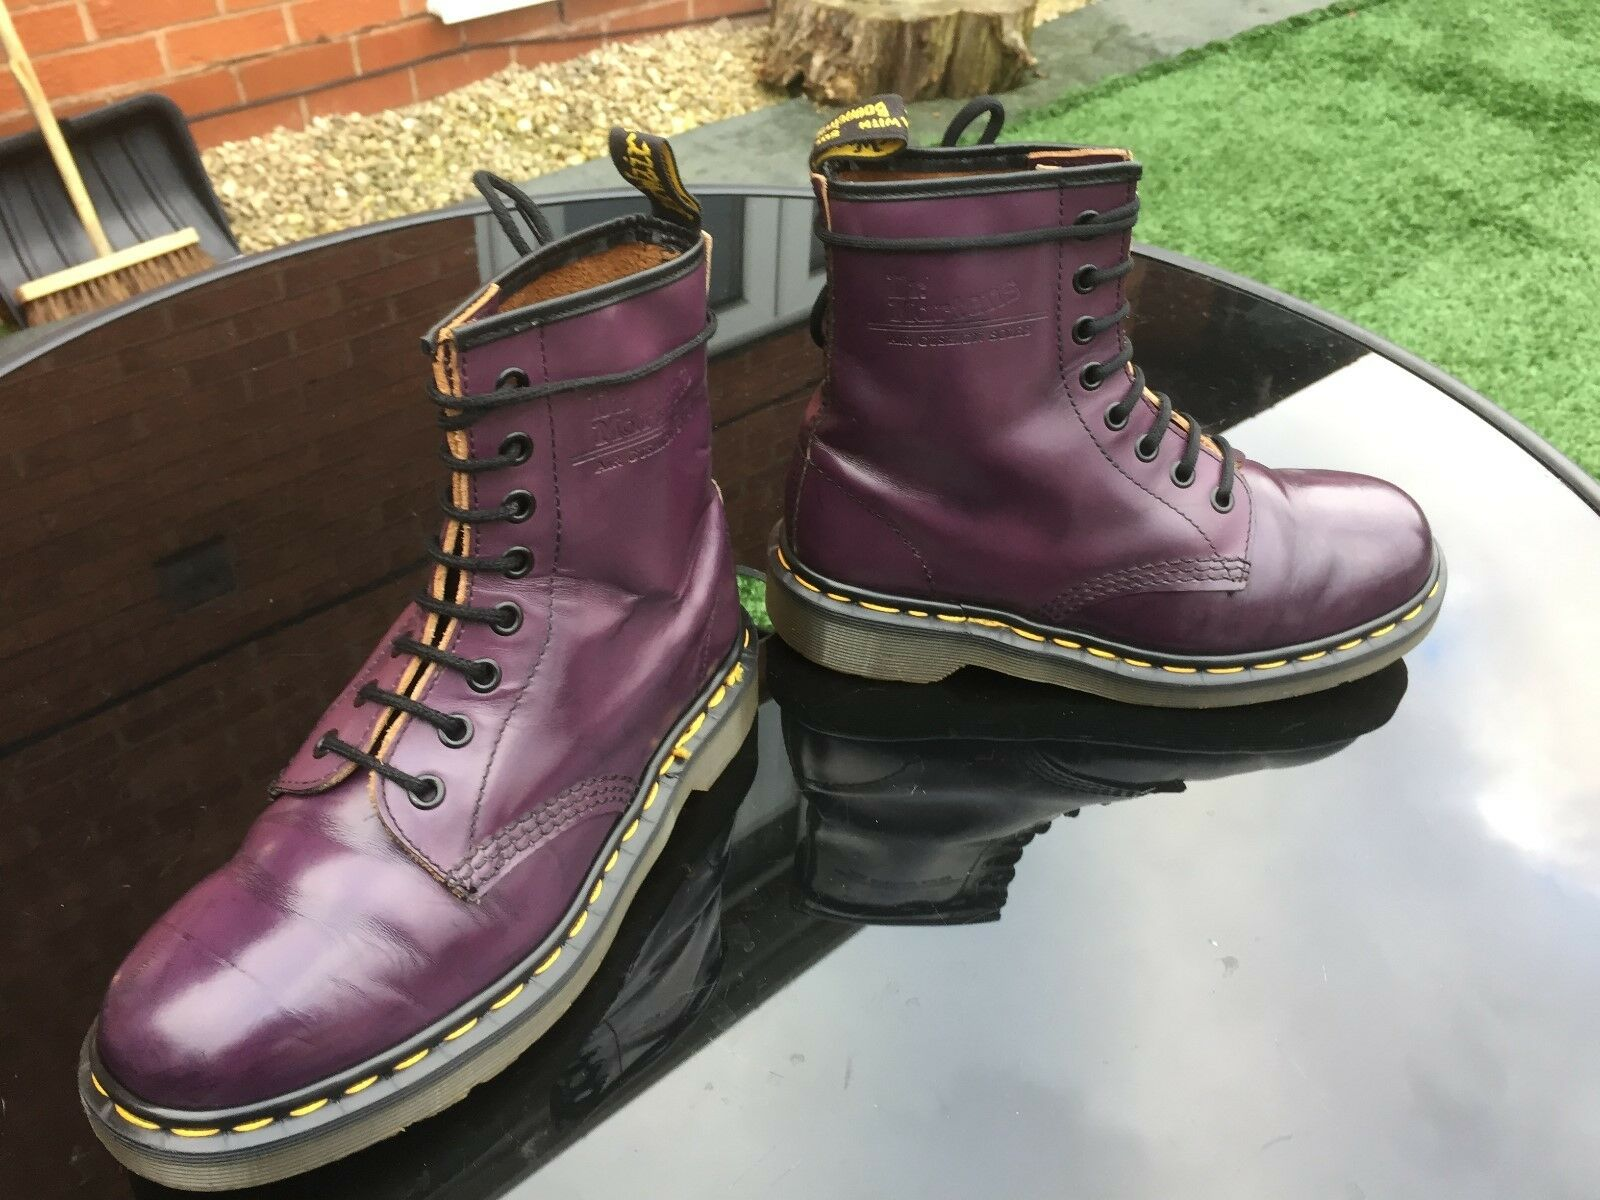 Vintage Dr Martens 1460 UK purple arcadia leather boots UK 1460 4 EU 37 Made in England b5ff11